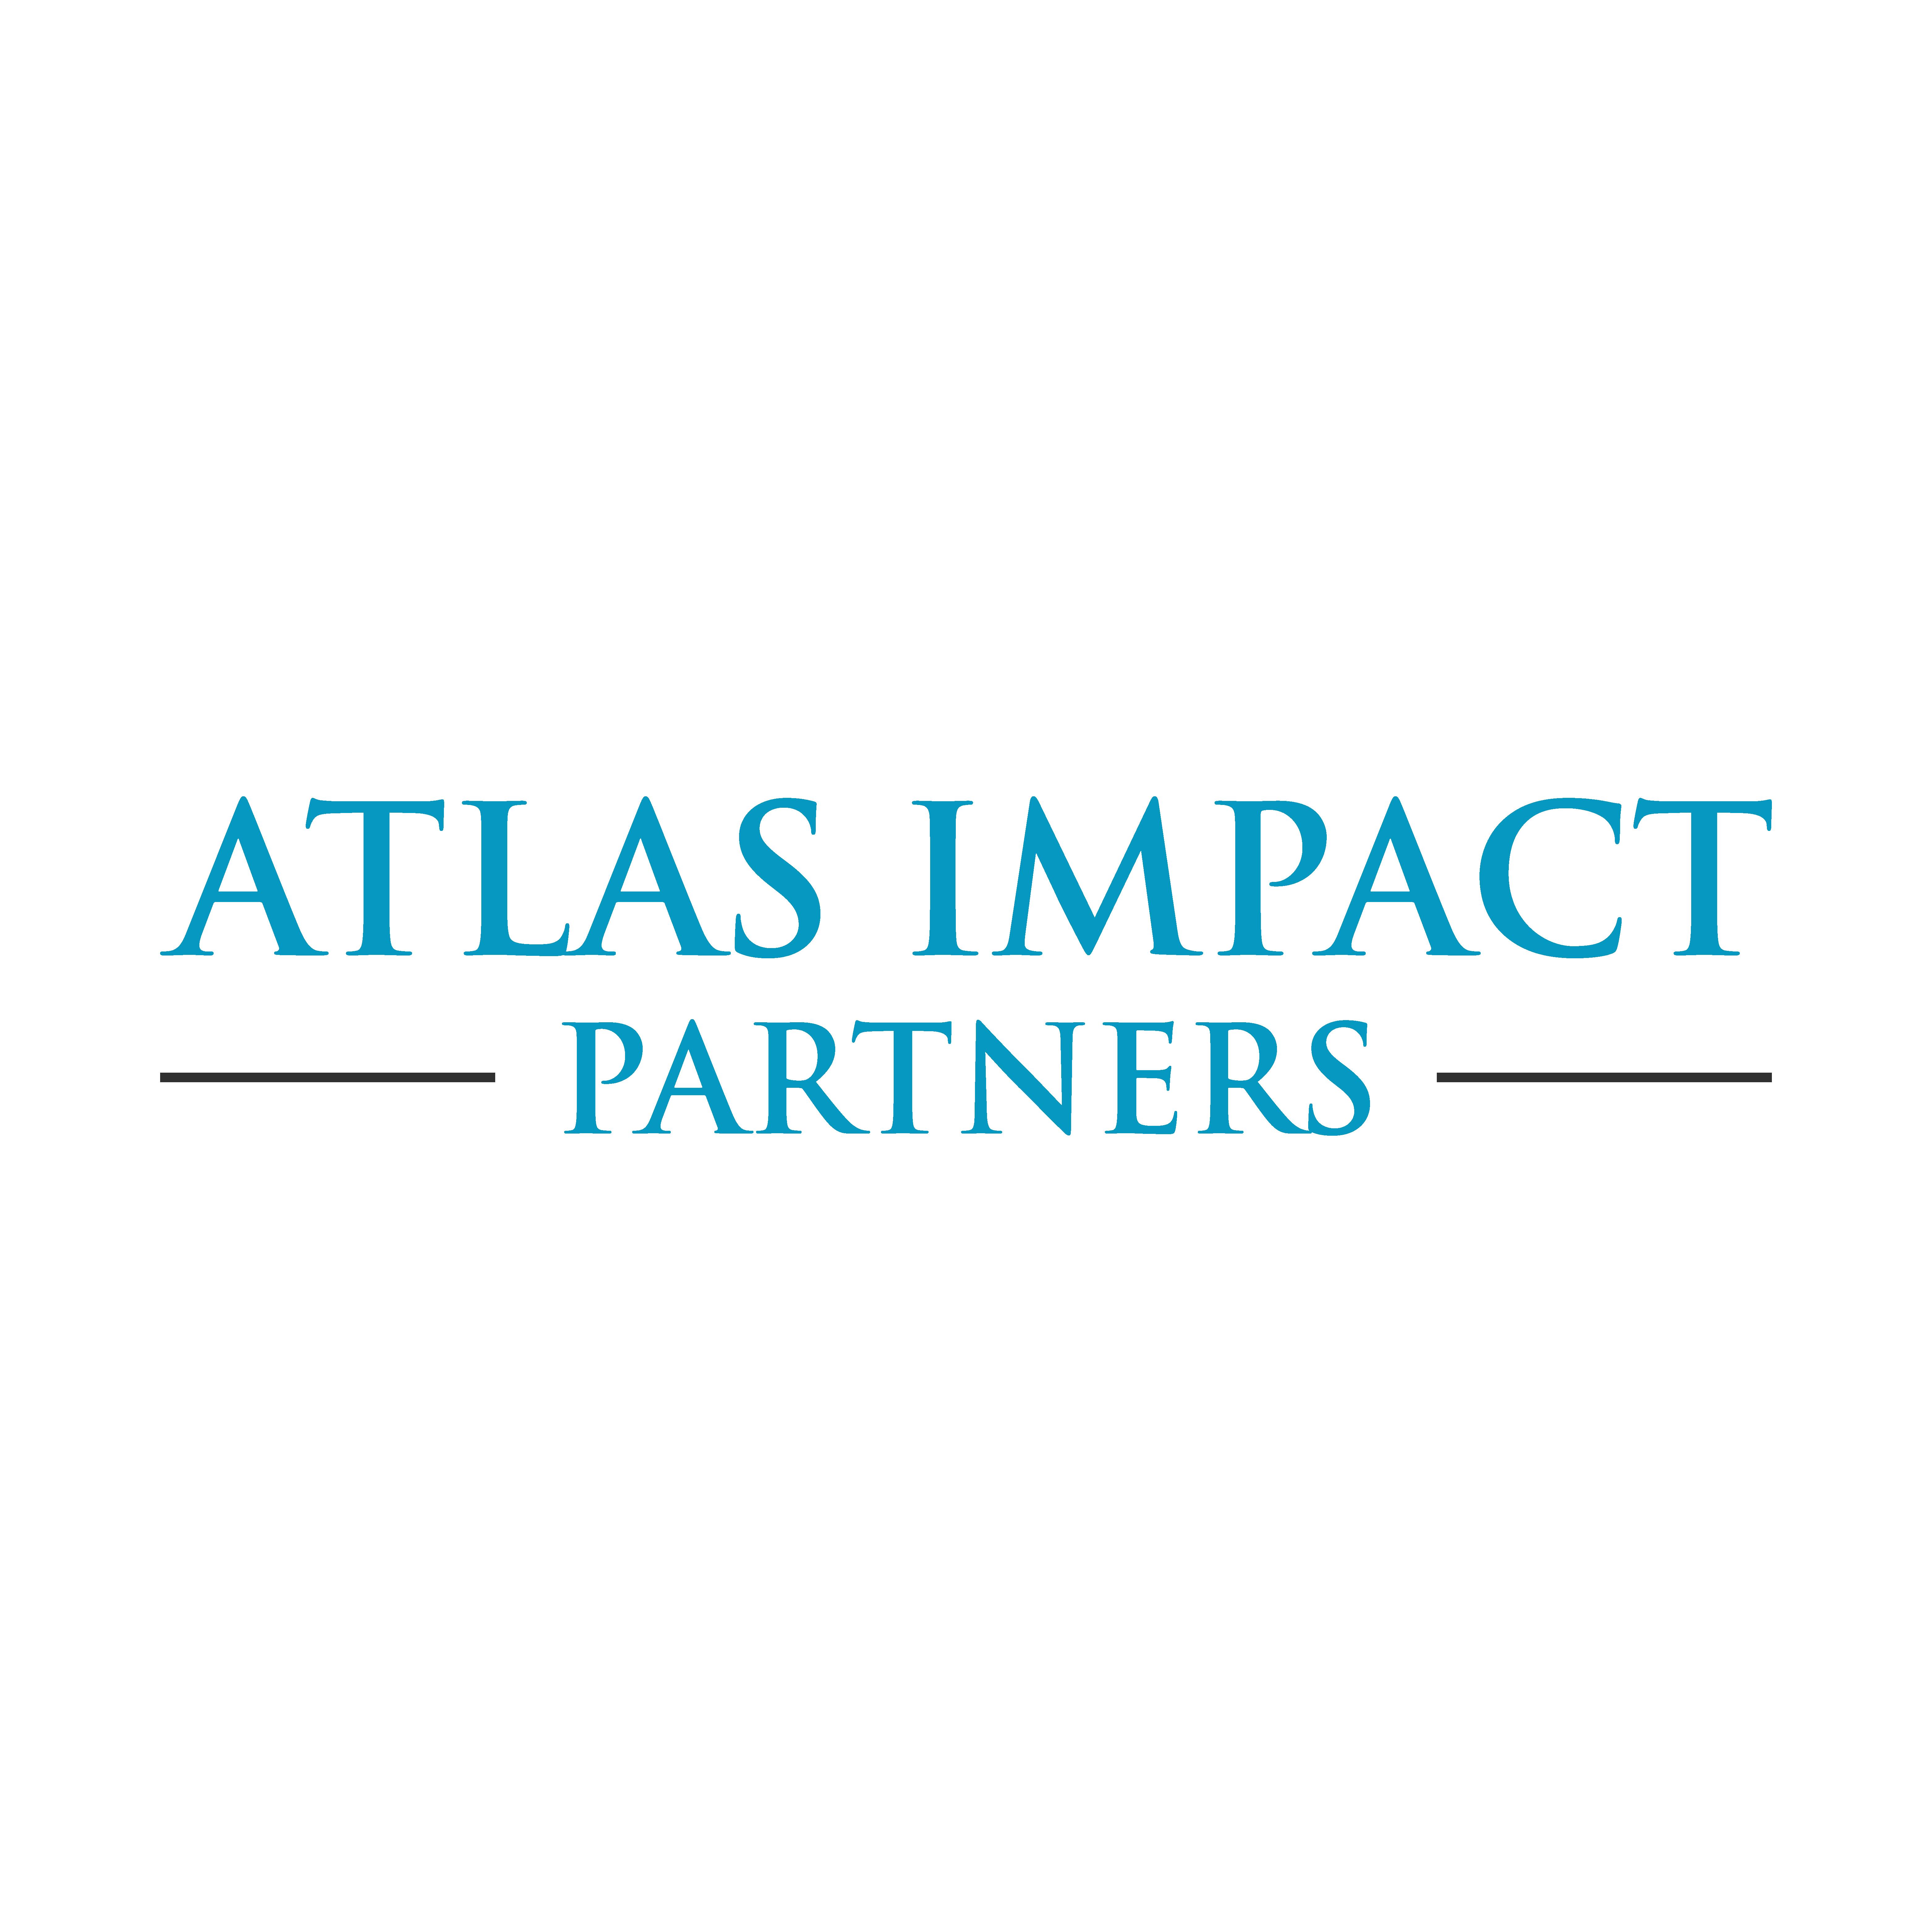 Atlas Impact Partners logo